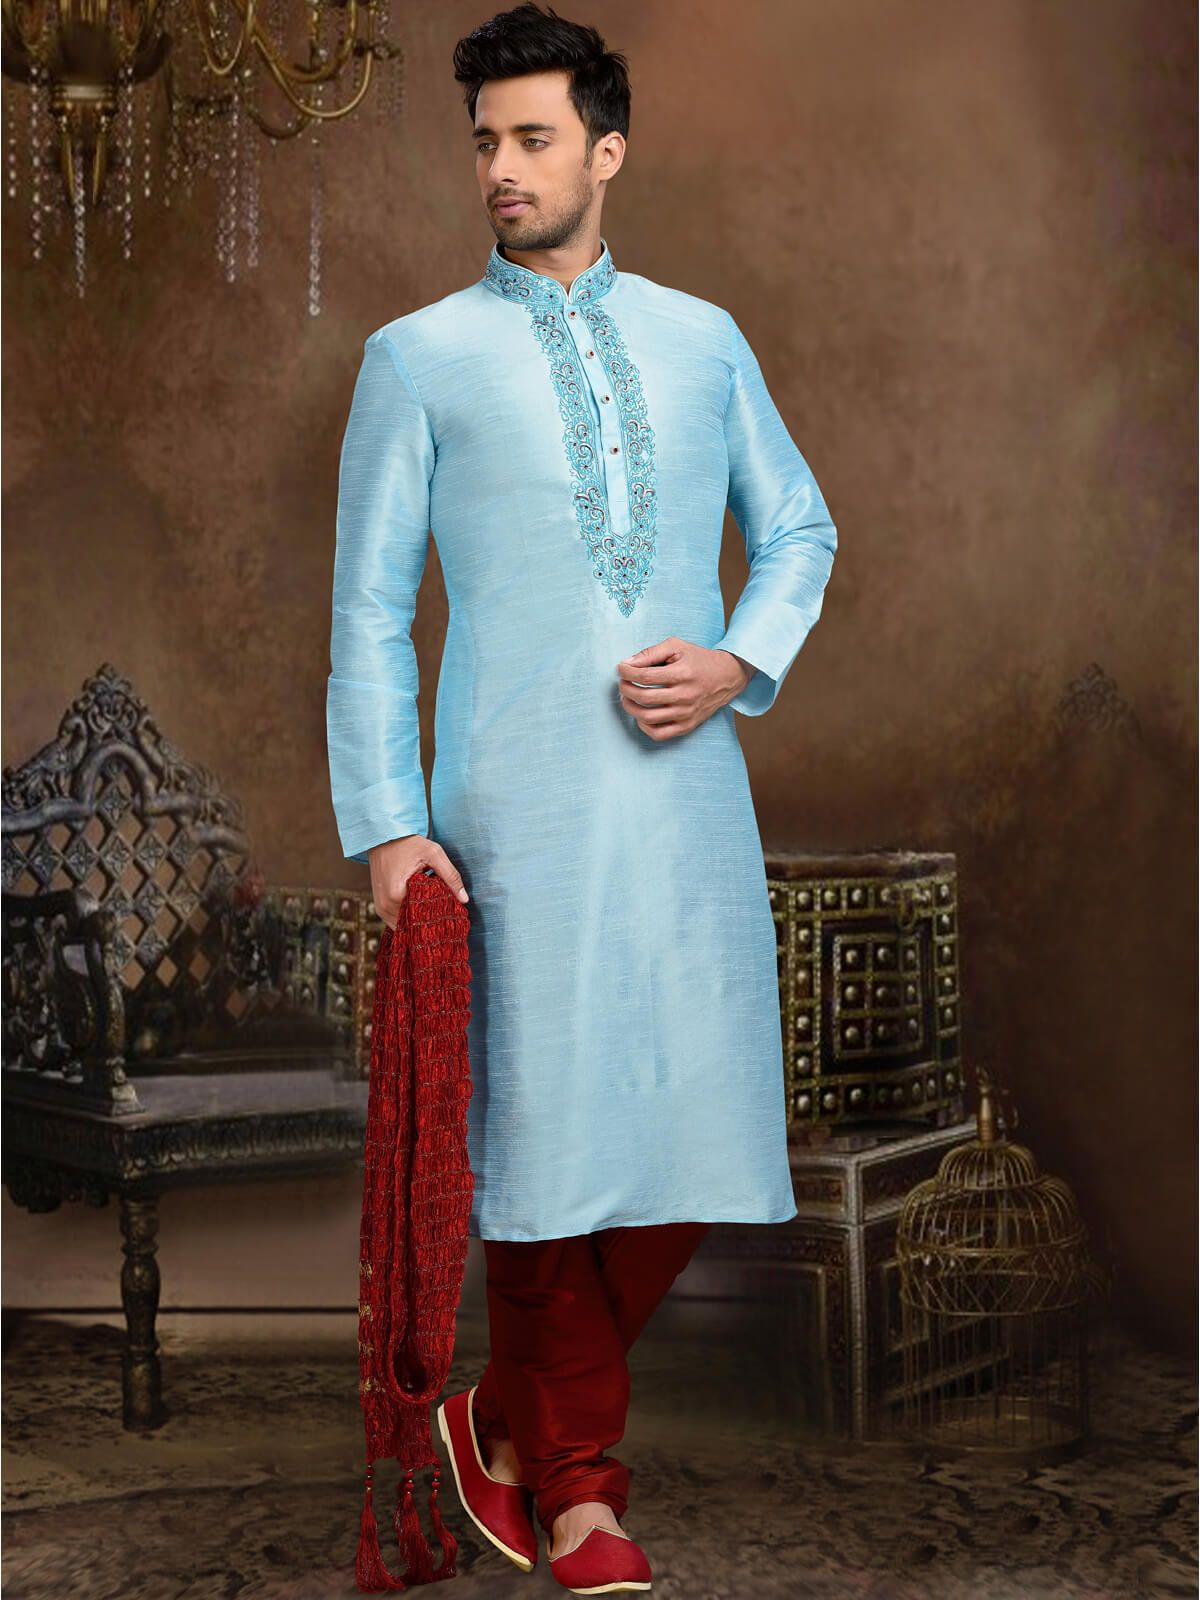 Angelic sky blue and red wedding wear dupion kurta pyjama. Having ...